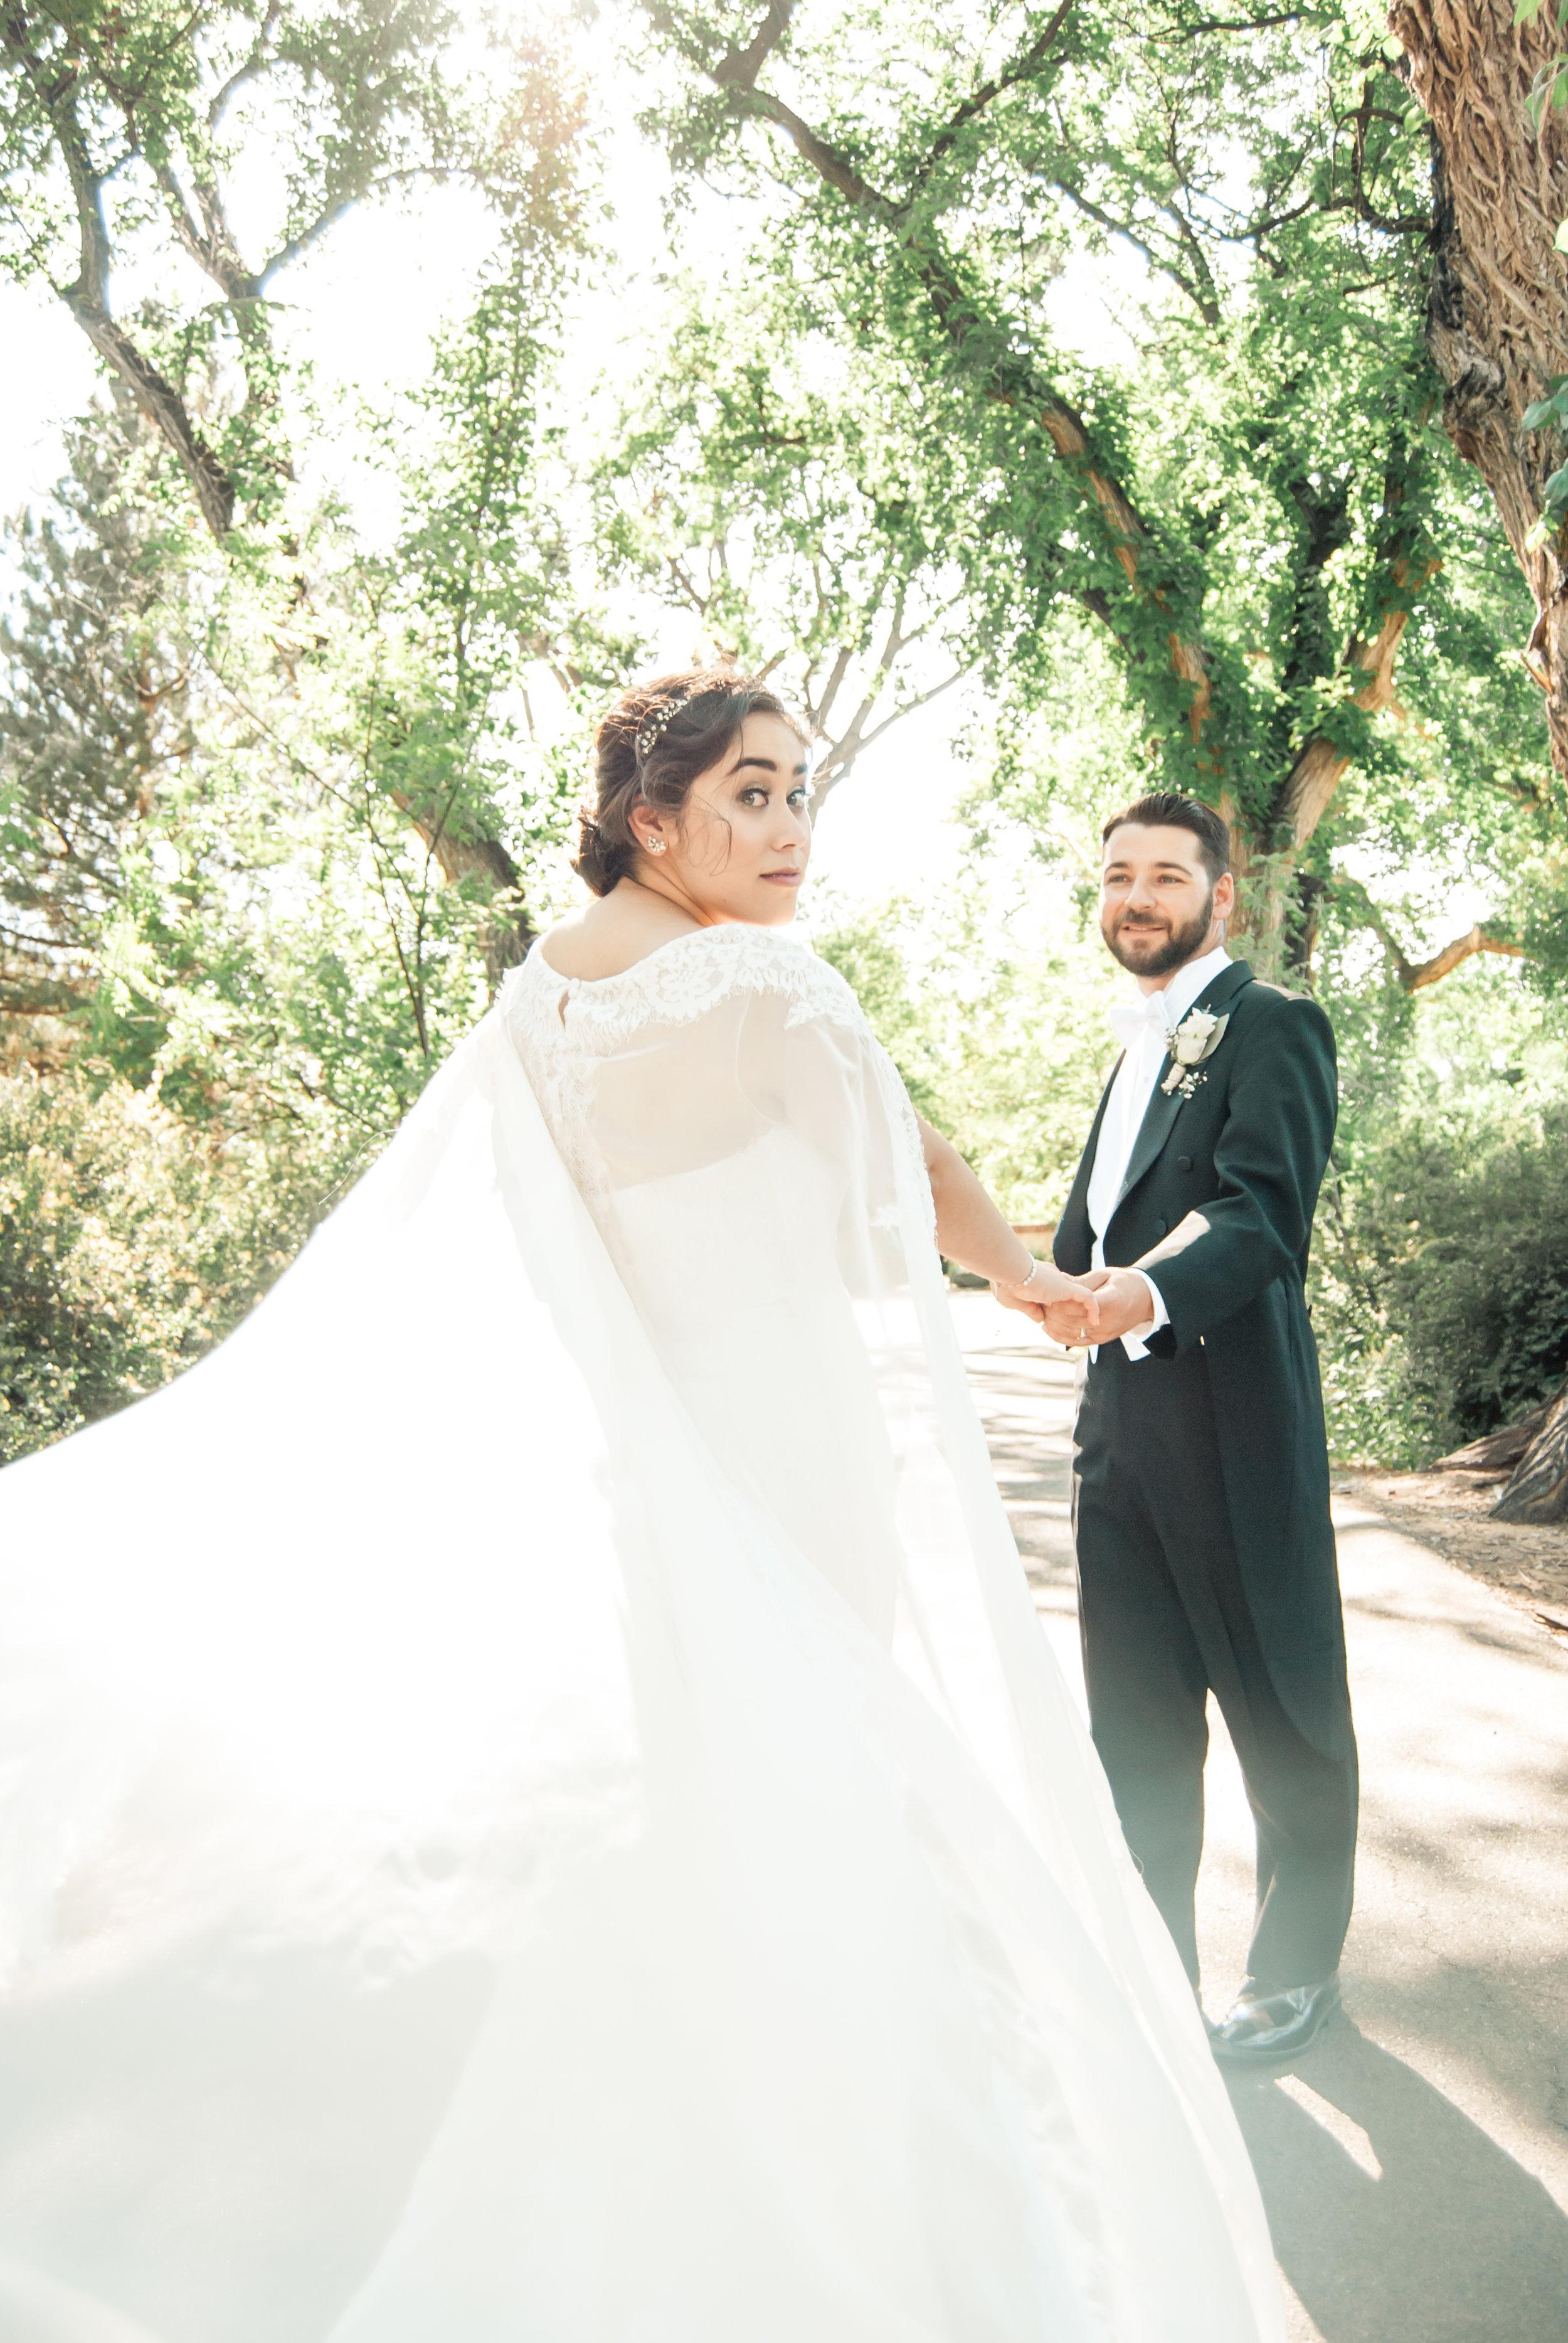 WeddingPortfolio-98.jpg